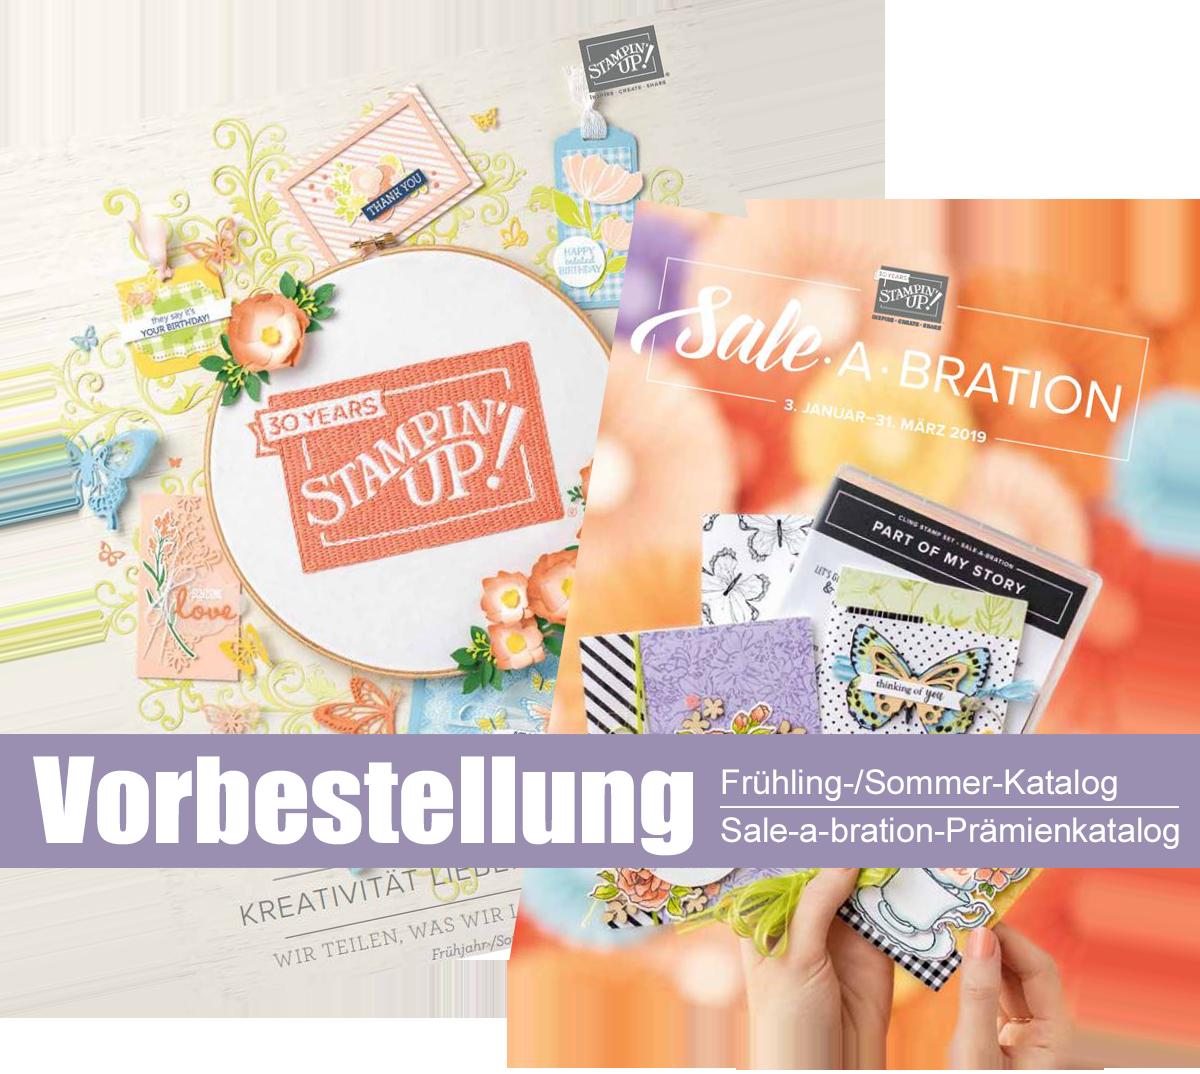 Vorbestellung Frühling/Sommer & SAB